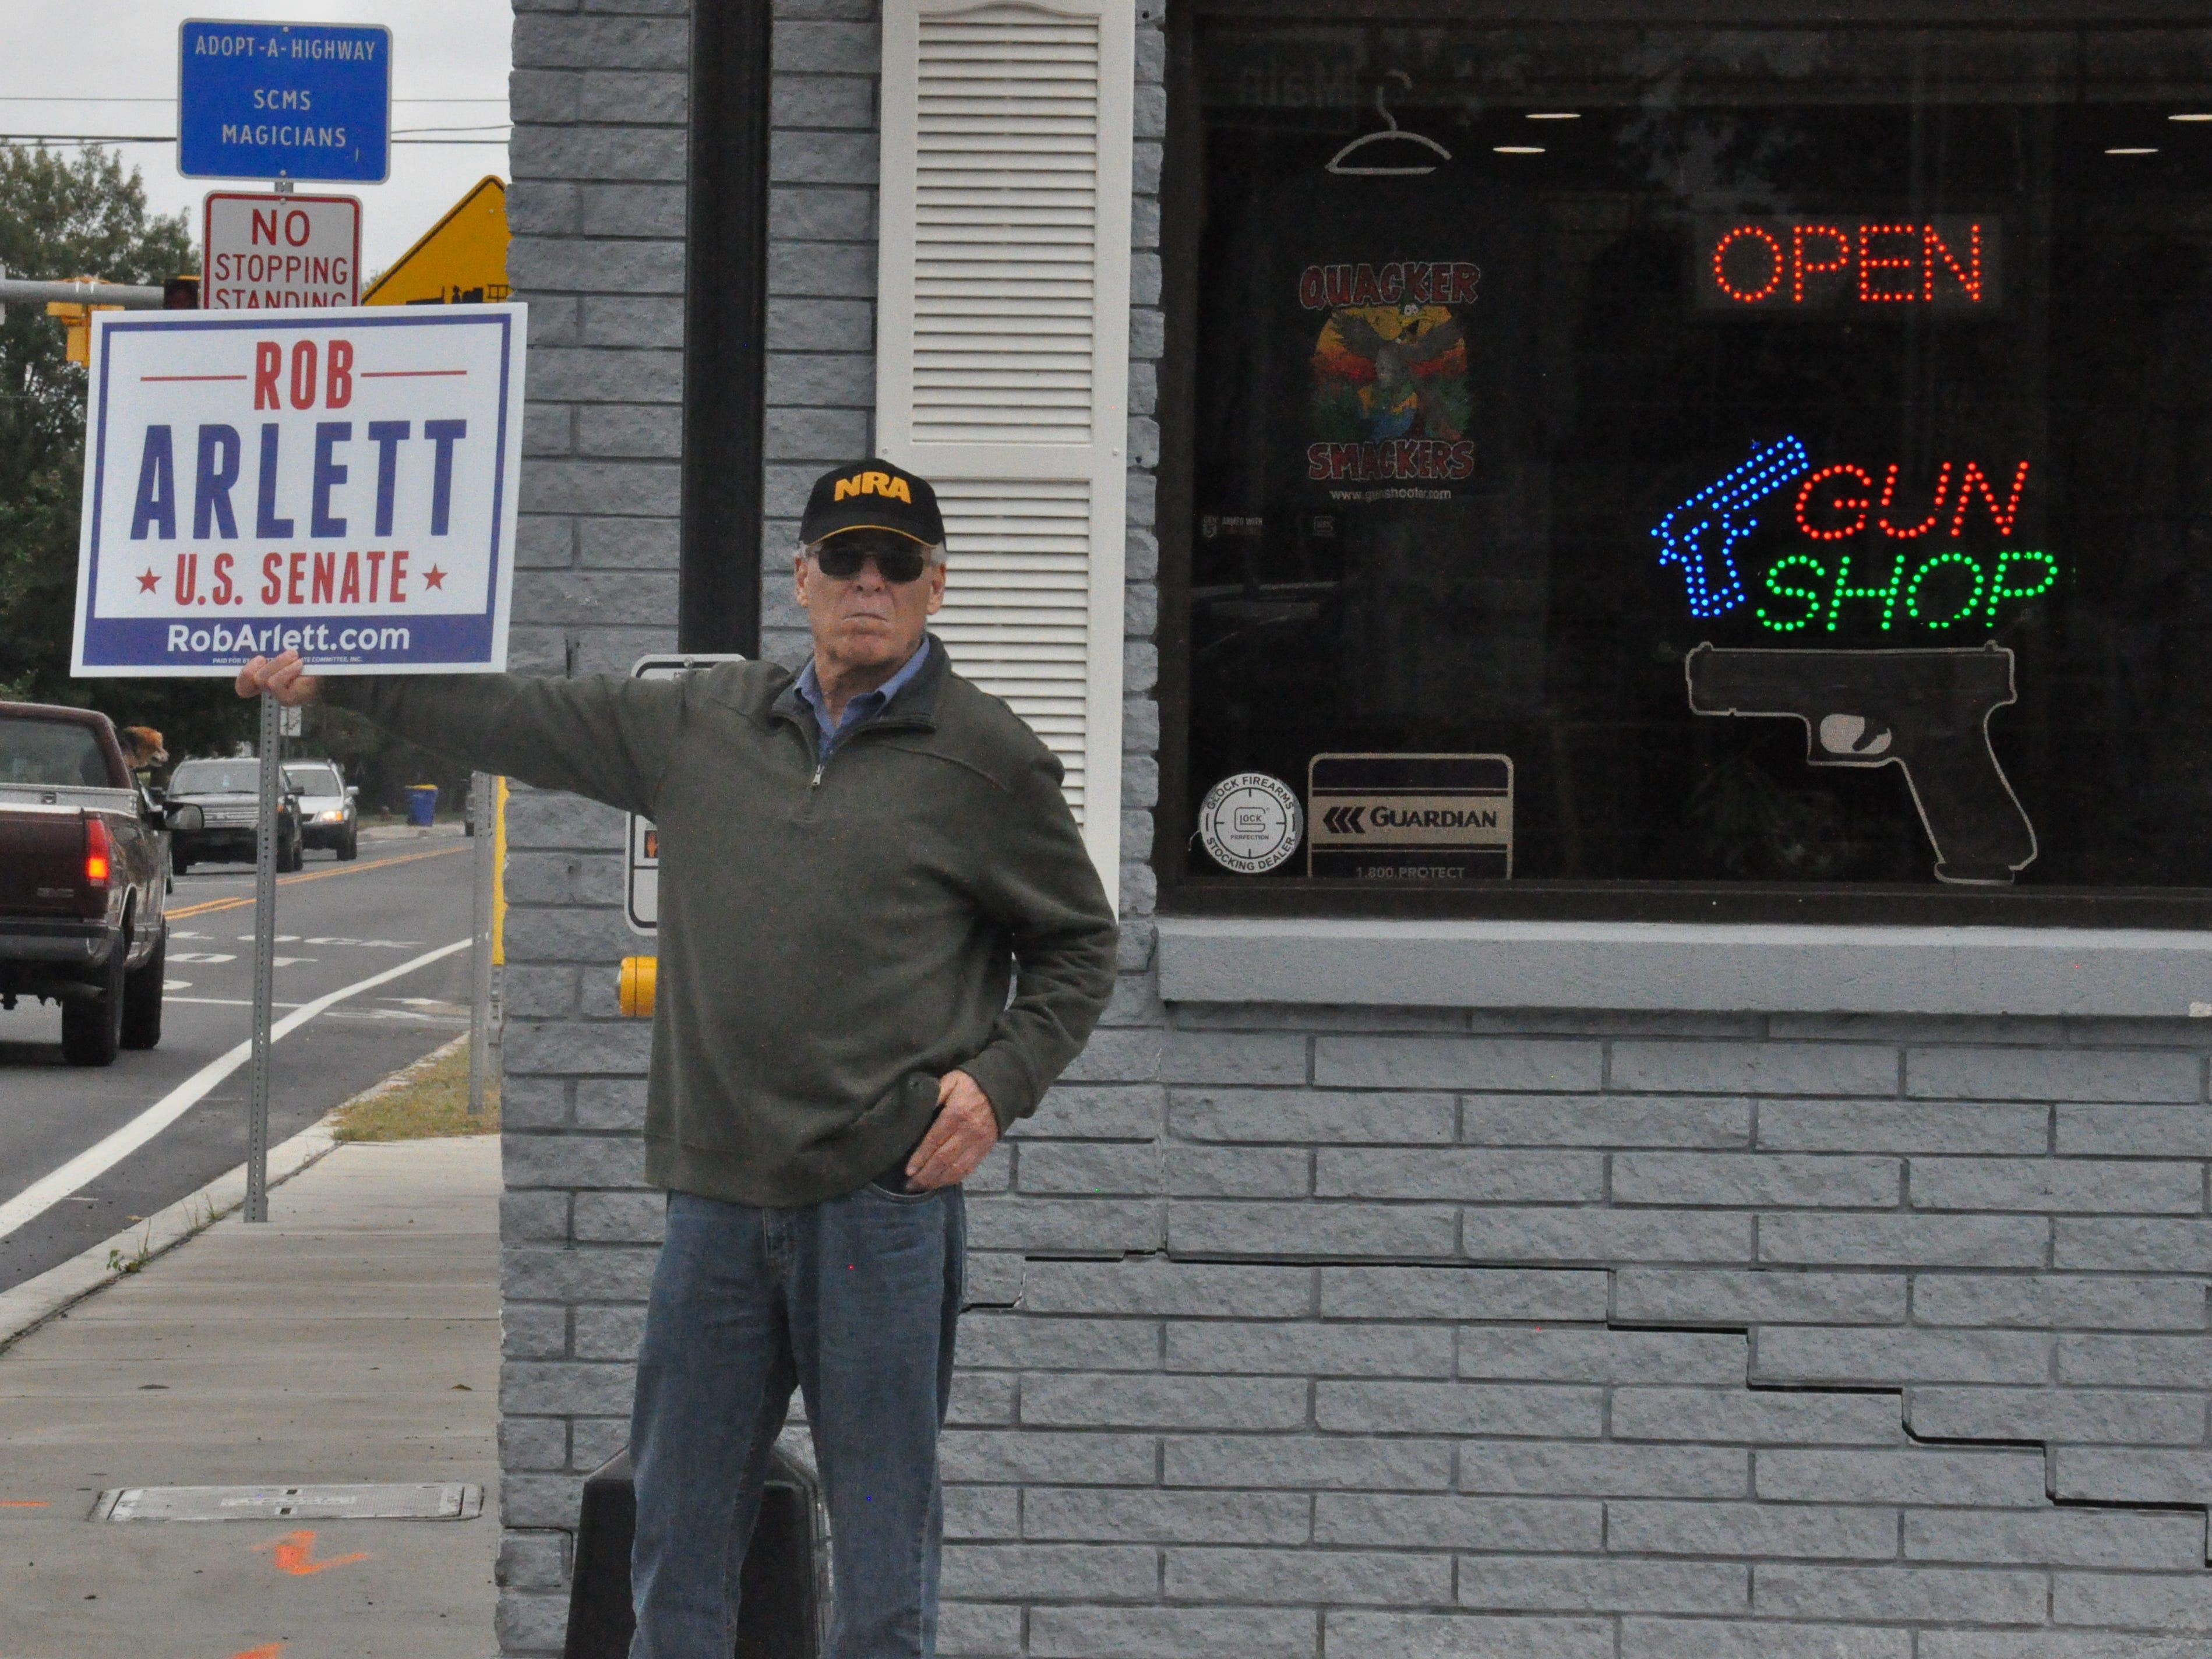 Retired civil service worker Thomas Fudge, 67, holds a sign for U.S. Senate candidate Rob Arlett on a street corner in Millsboro.